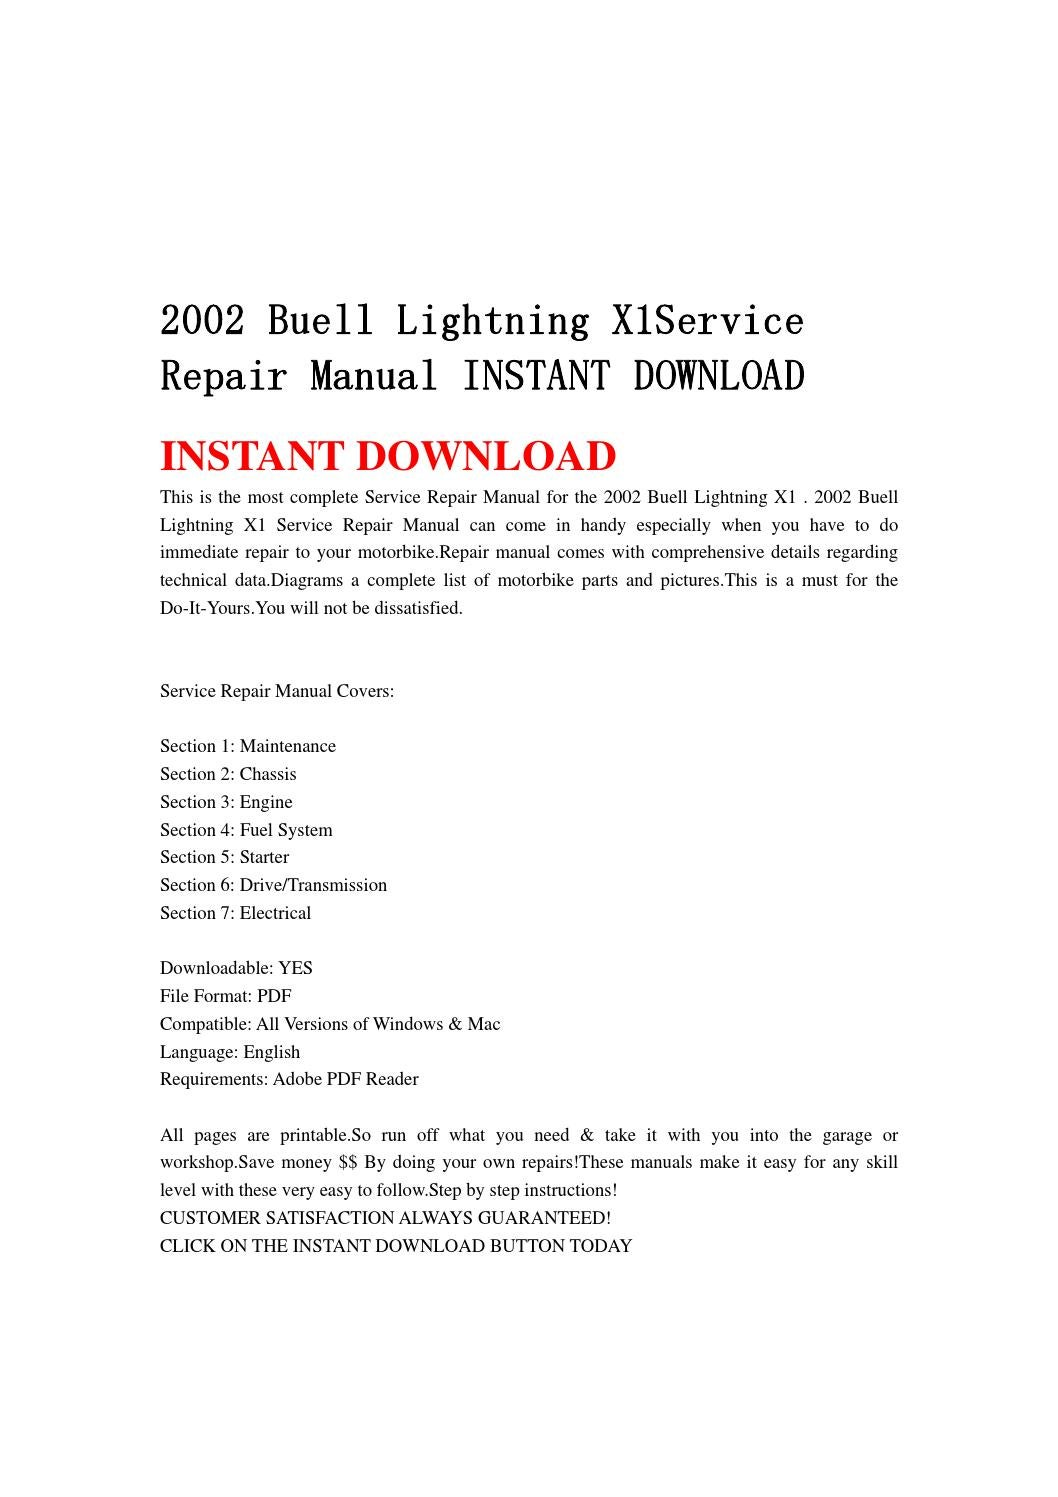 2002 buell lightning x1service repair manual instant downloa by hnjhhnj -  issuu